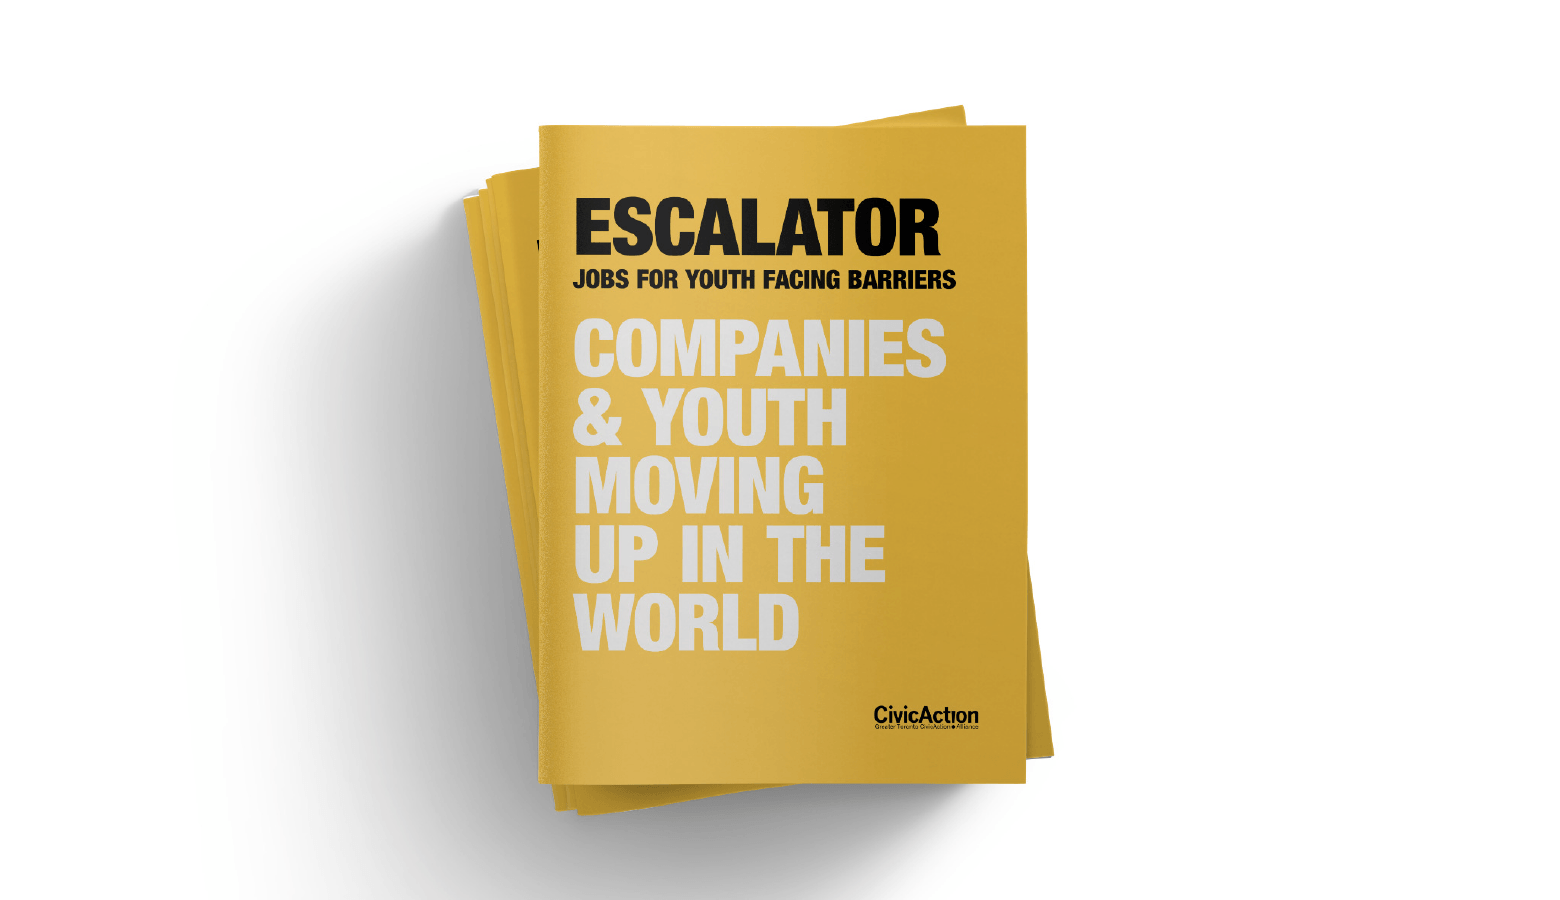 CivicAction's Escalator